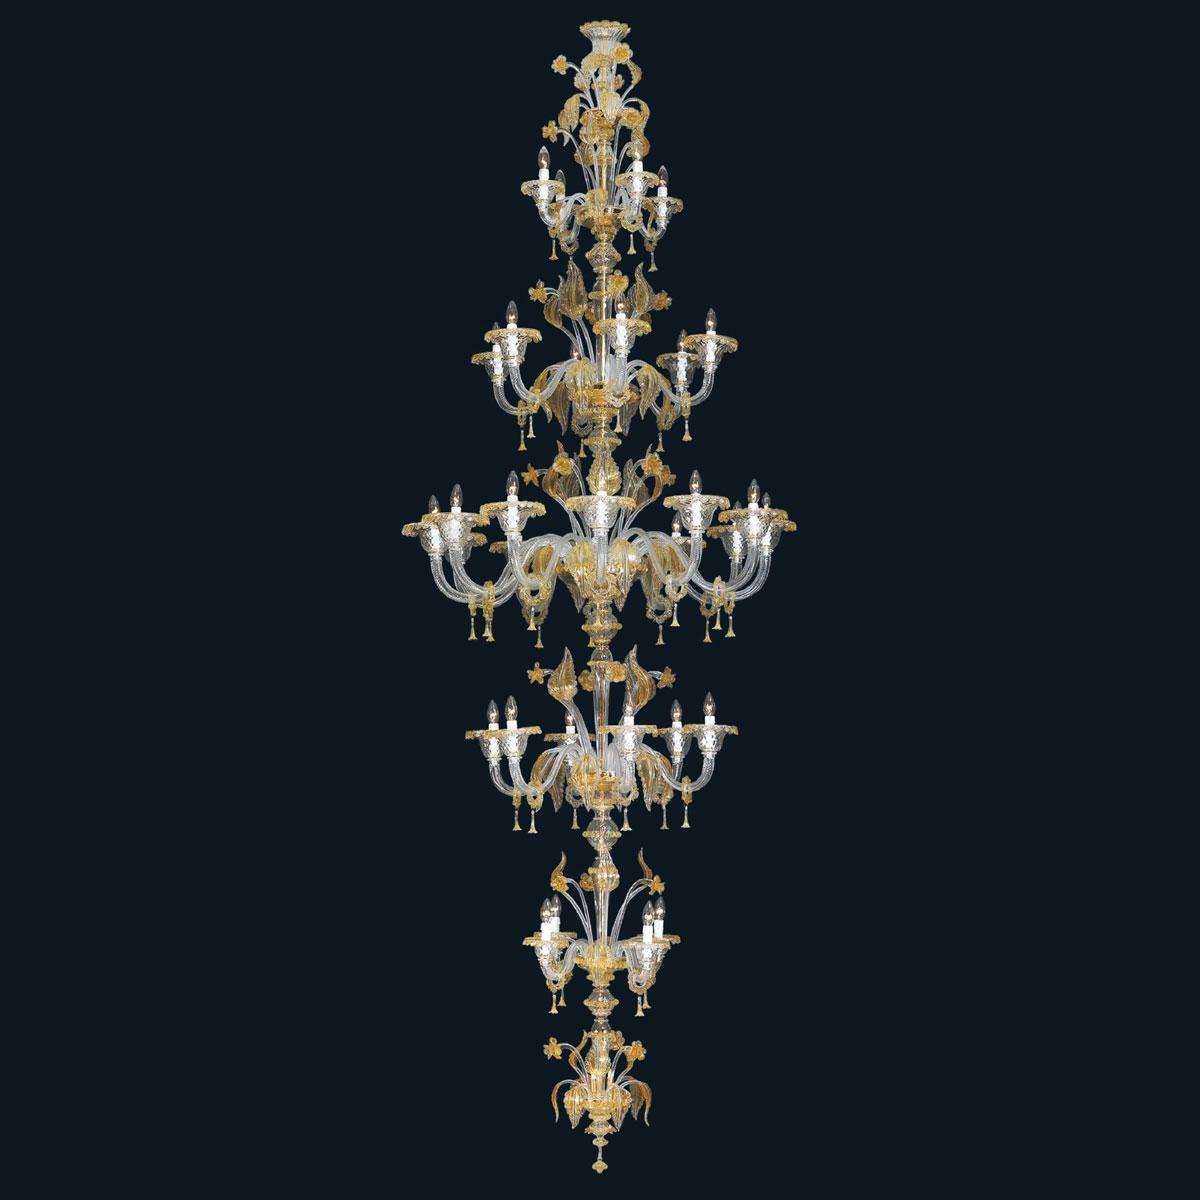 """Rachelle"" Murano glass chandelier - 32 lights -"